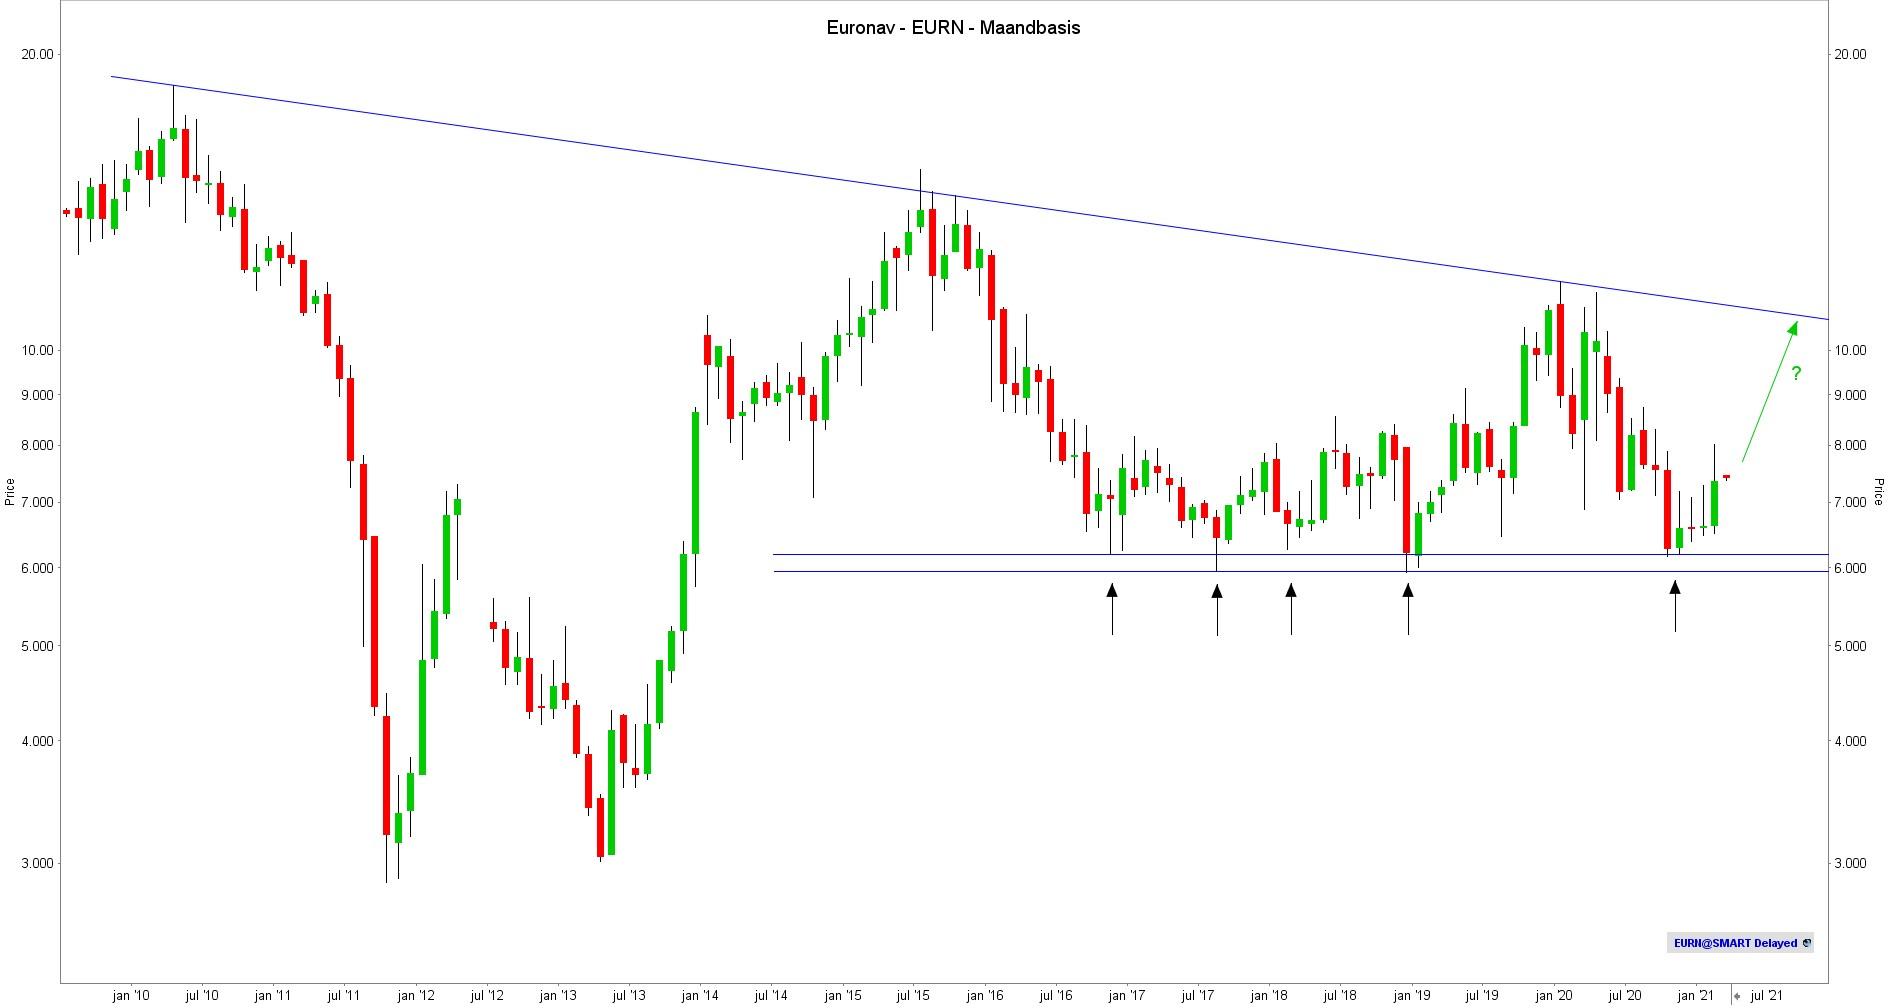 aandeel euronav maandbasis